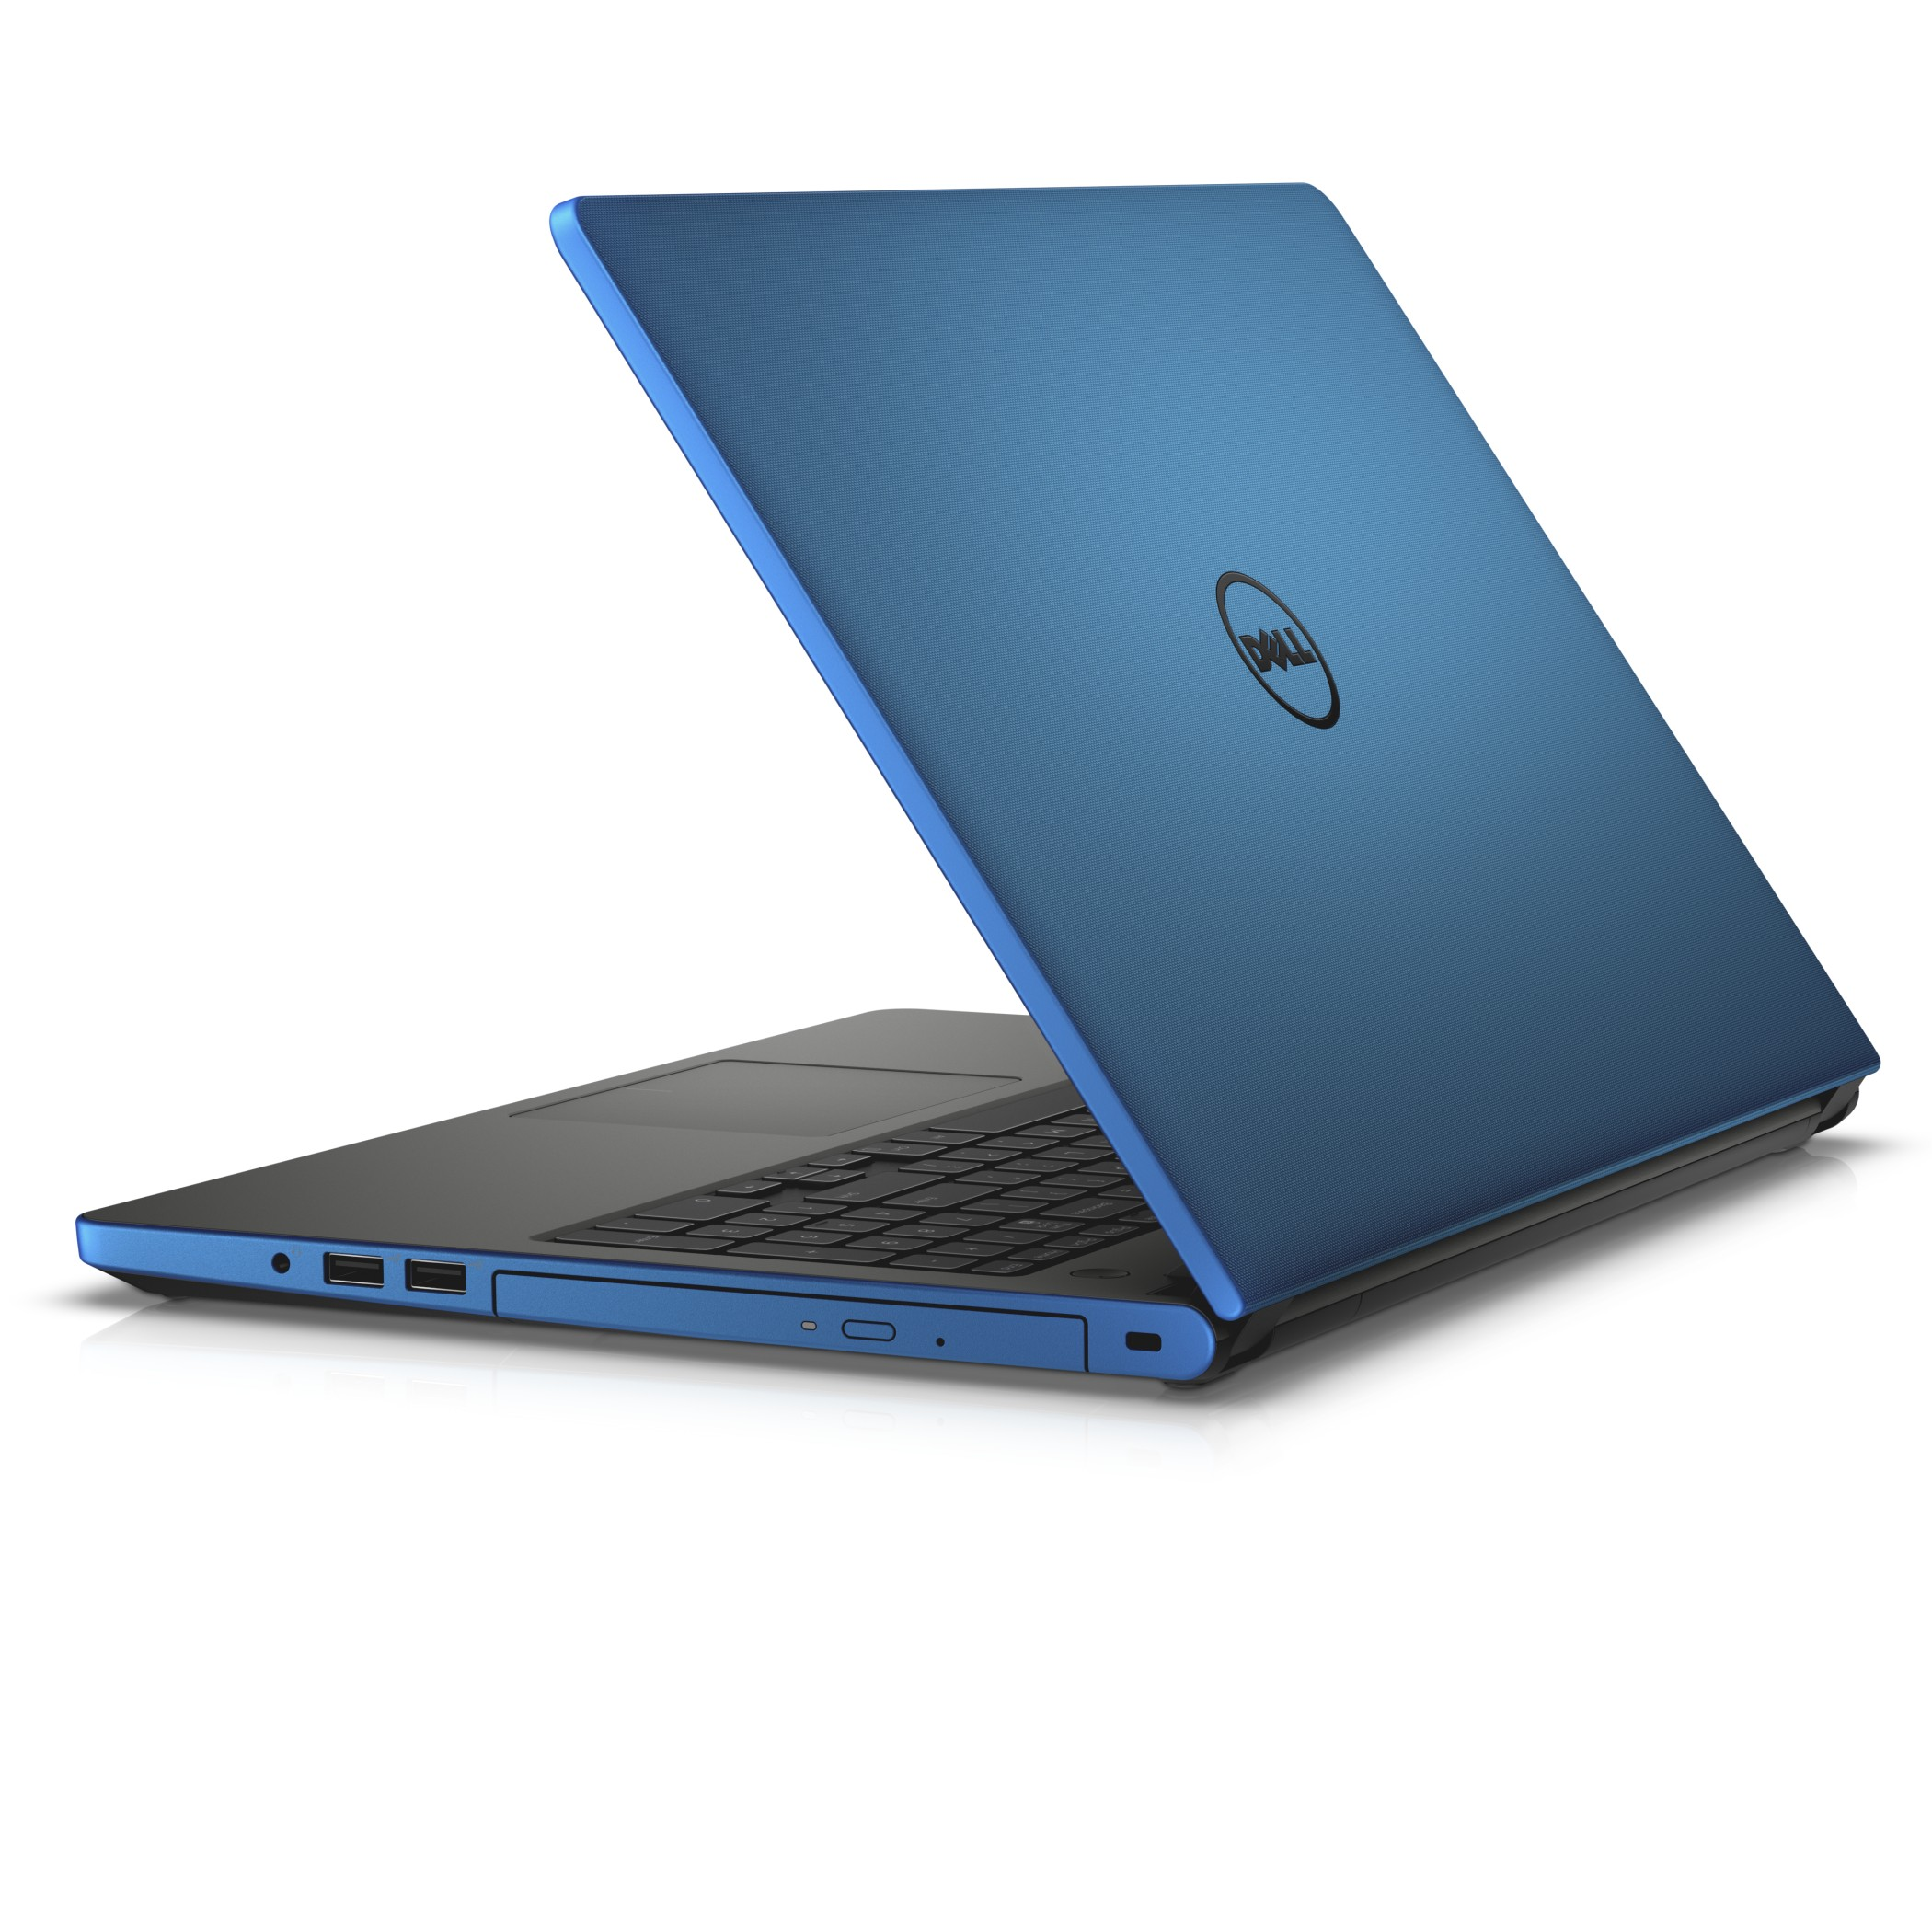 "Dell Inspiron 5559 15"" i5-6200U/4GB/500GB/M335-2G/HDMI/RJ45/WIFI/BT/MCR/W10UPG/2NBD modrý"